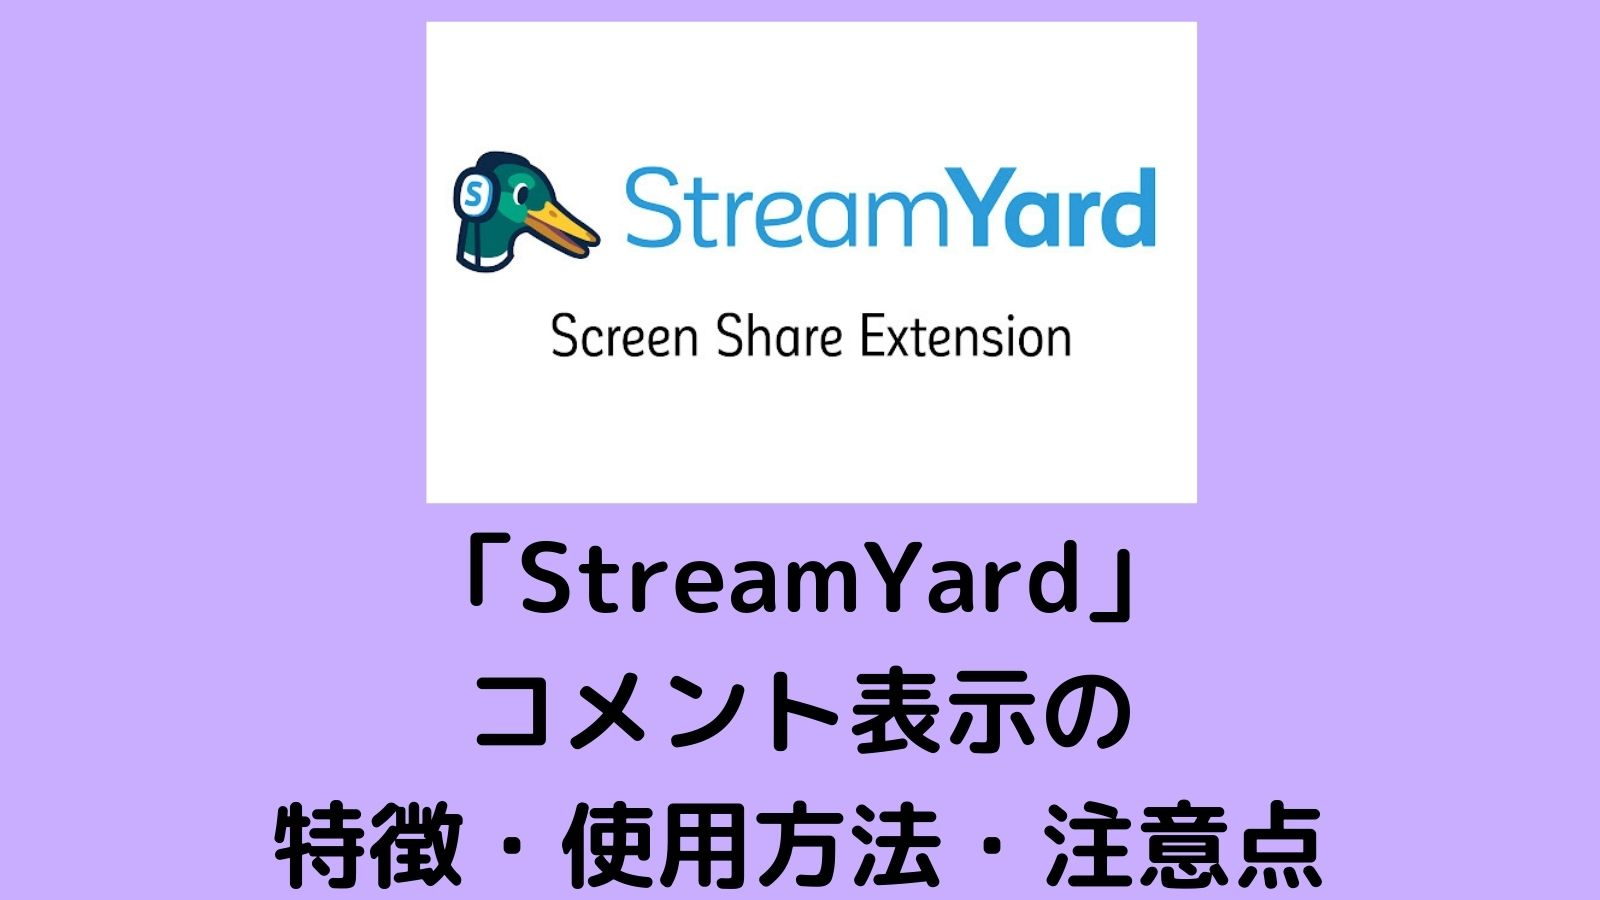 StreamYardのコメント表示機能でライブ配信が生まれ変わる!特徴・使用方法・注意点について